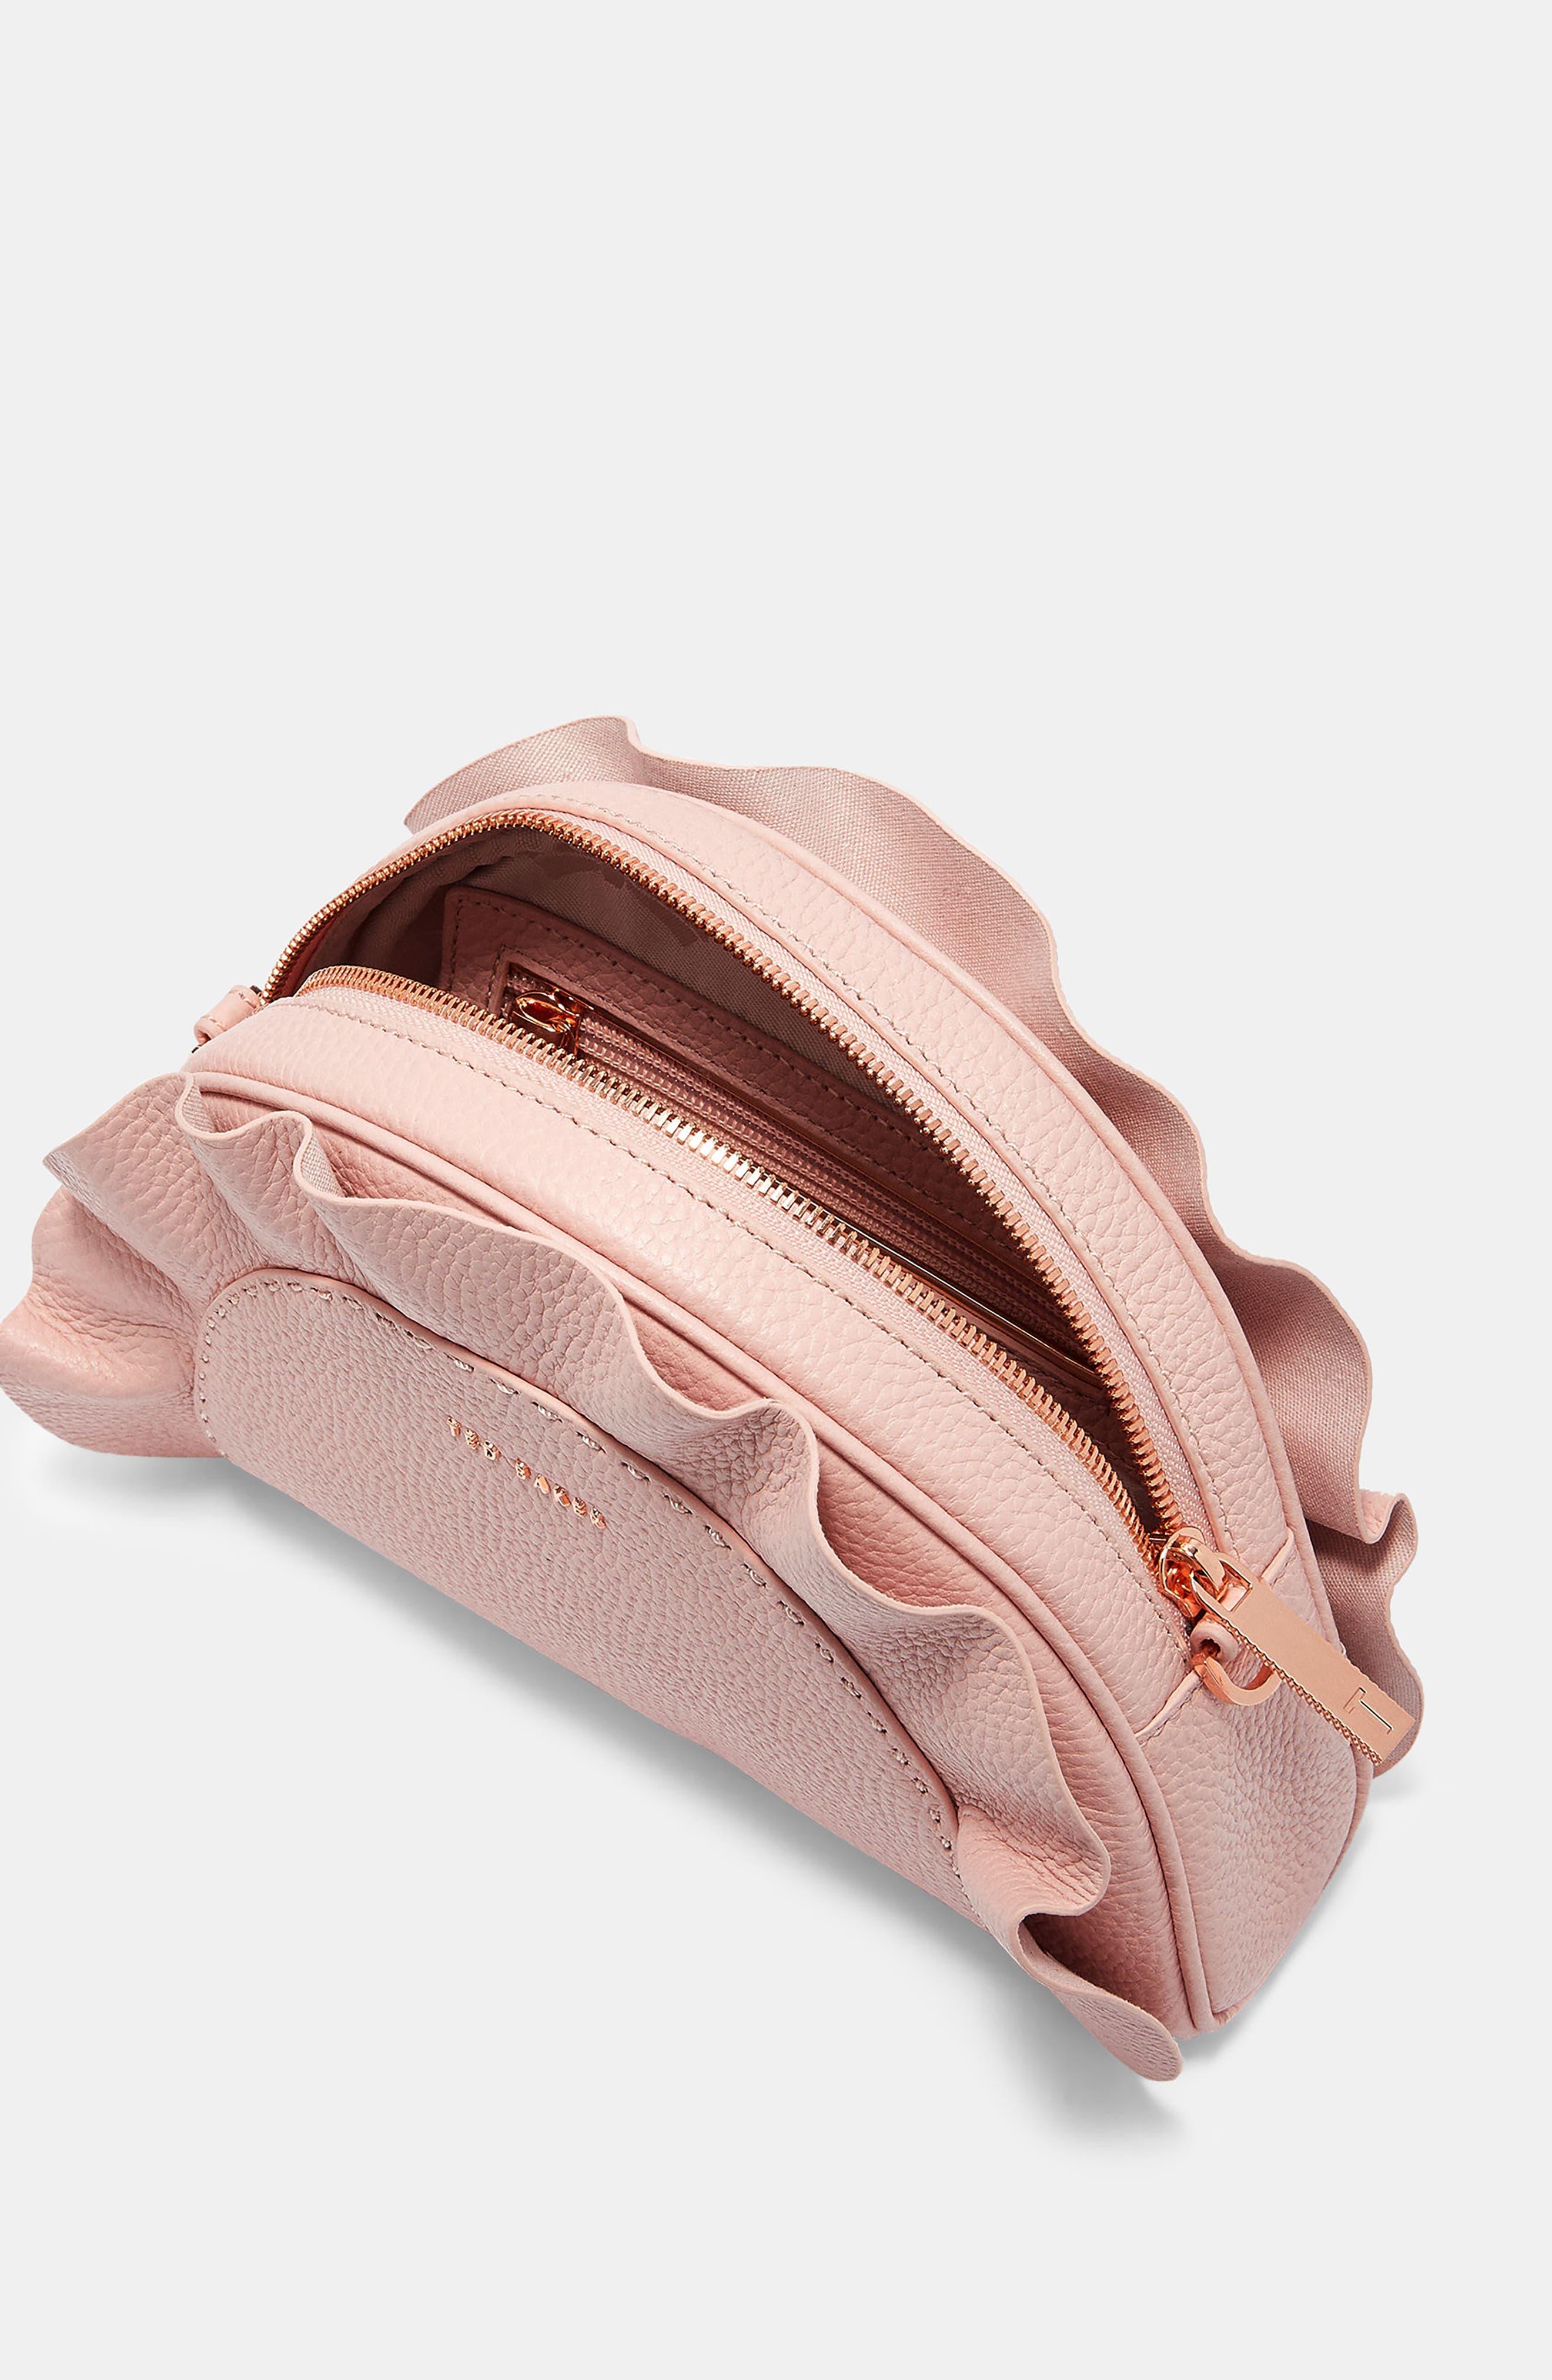 Ruffle Half Moon Leather Crossbody Bag,                             Alternate thumbnail 4, color,                             Light Pink